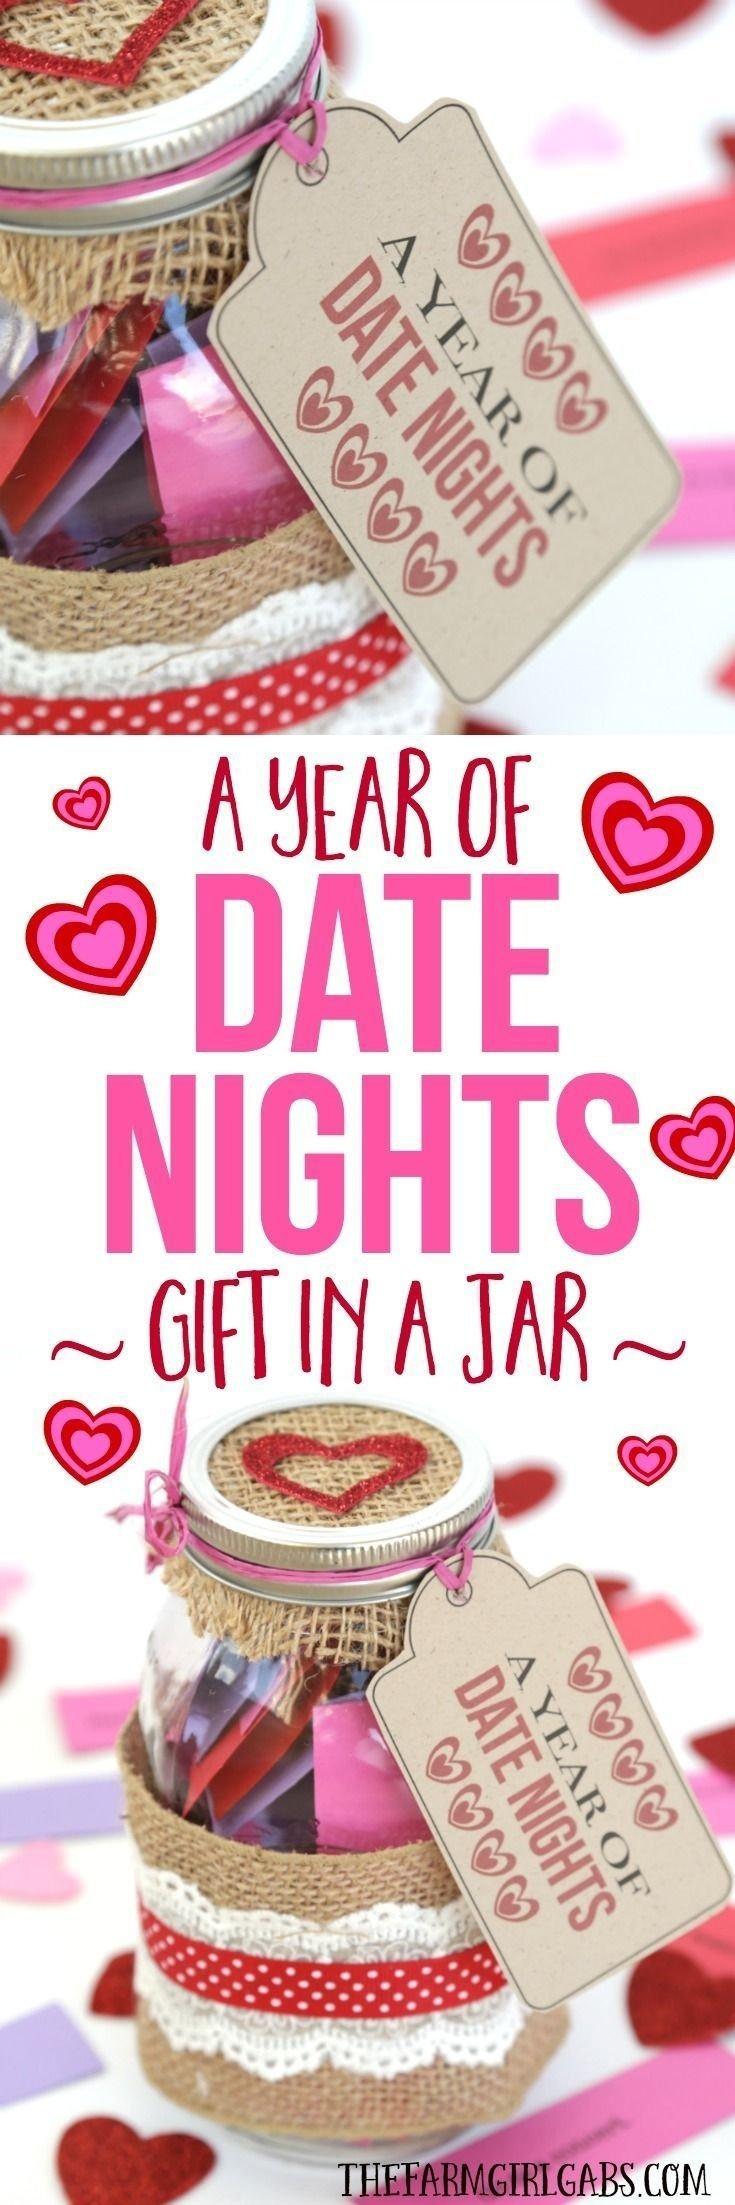 152 best date ideas images on pinterest | my love, romantic ideas